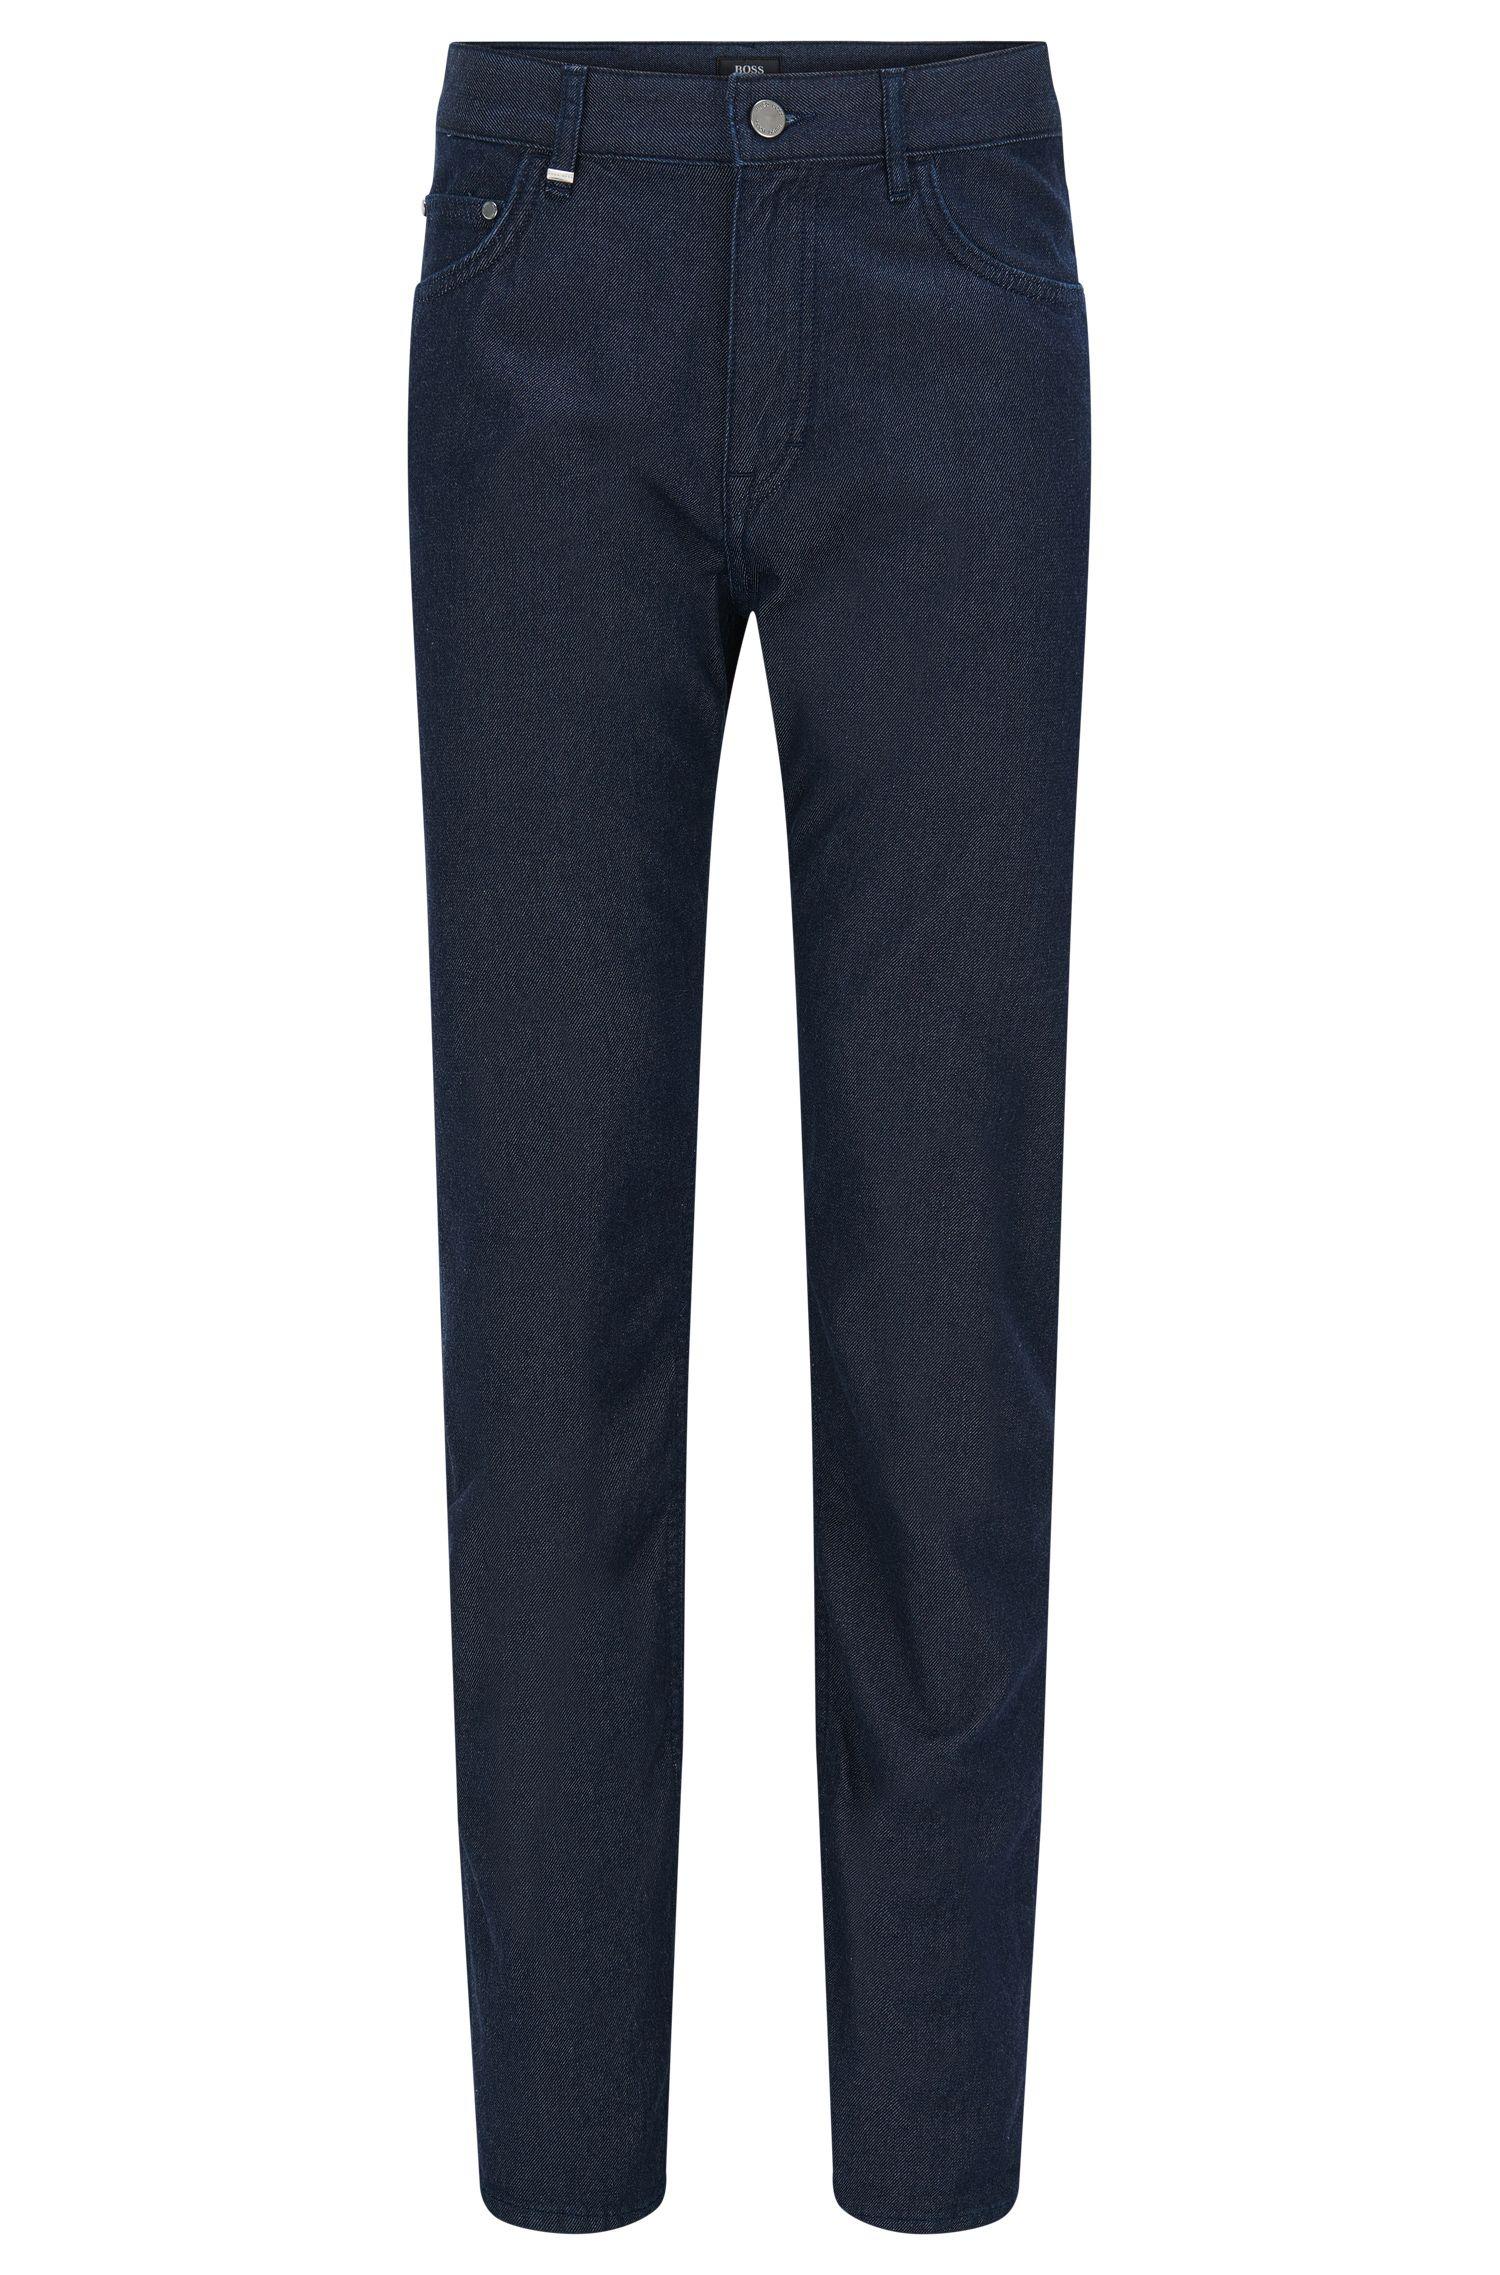 9.5 oz Cotton Cashmere Jeans, Comfort Fit | Albany